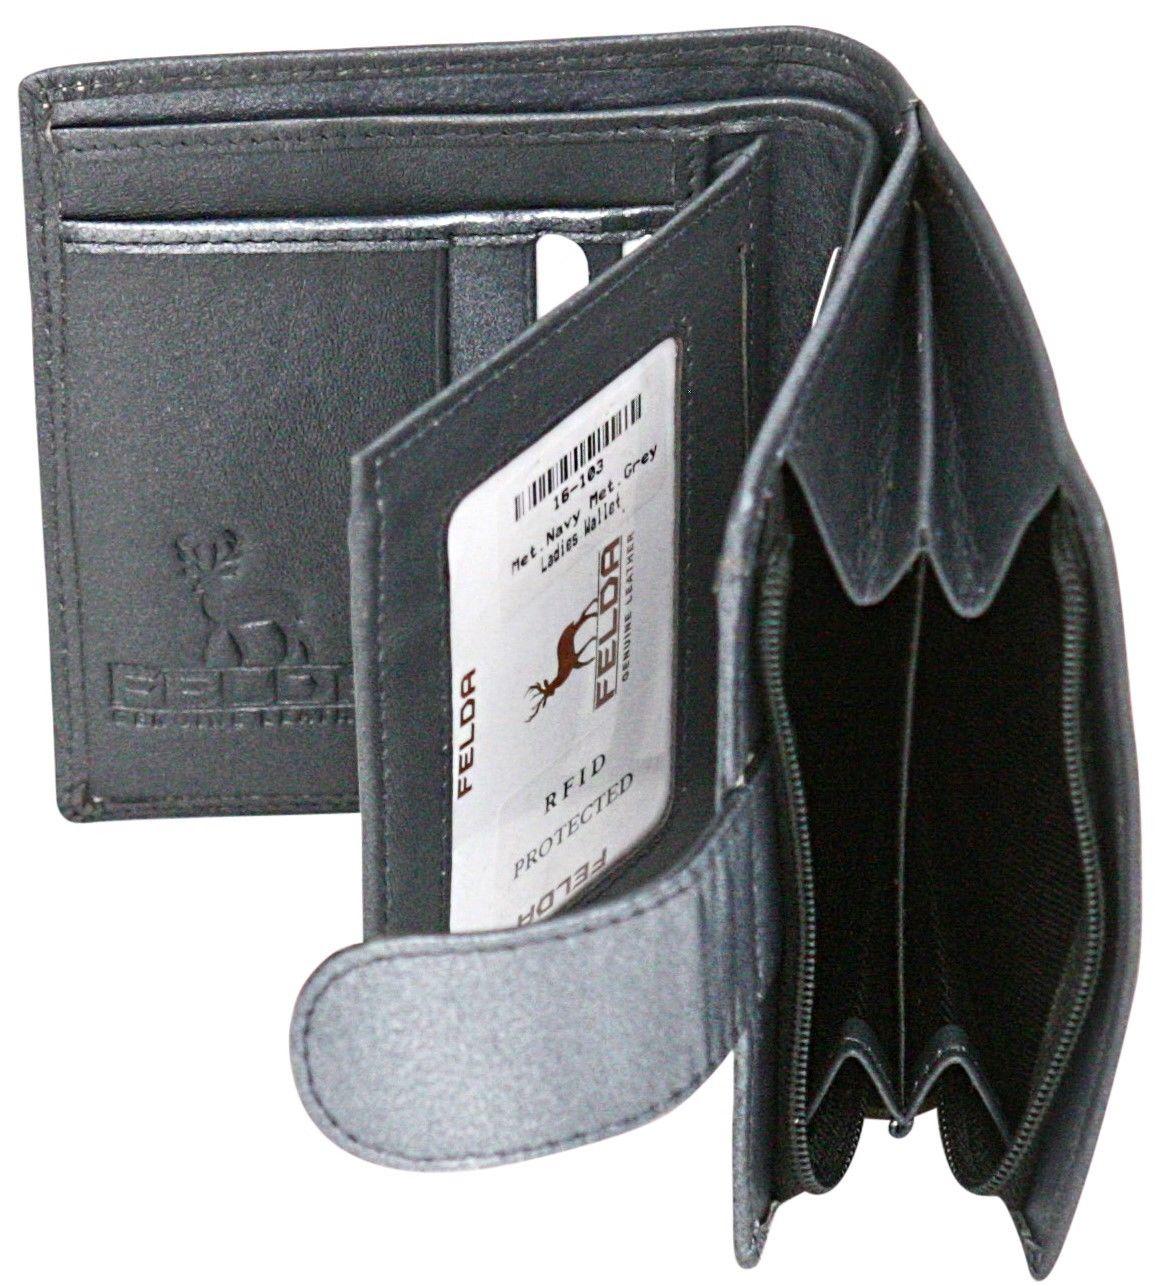 Felda-RFID-onorevoli-MEDAGLIA-amp-Card-Purse-Wallet-Genuine-Leather-Multi-SOFT-BOX-REGALO miniatura 52